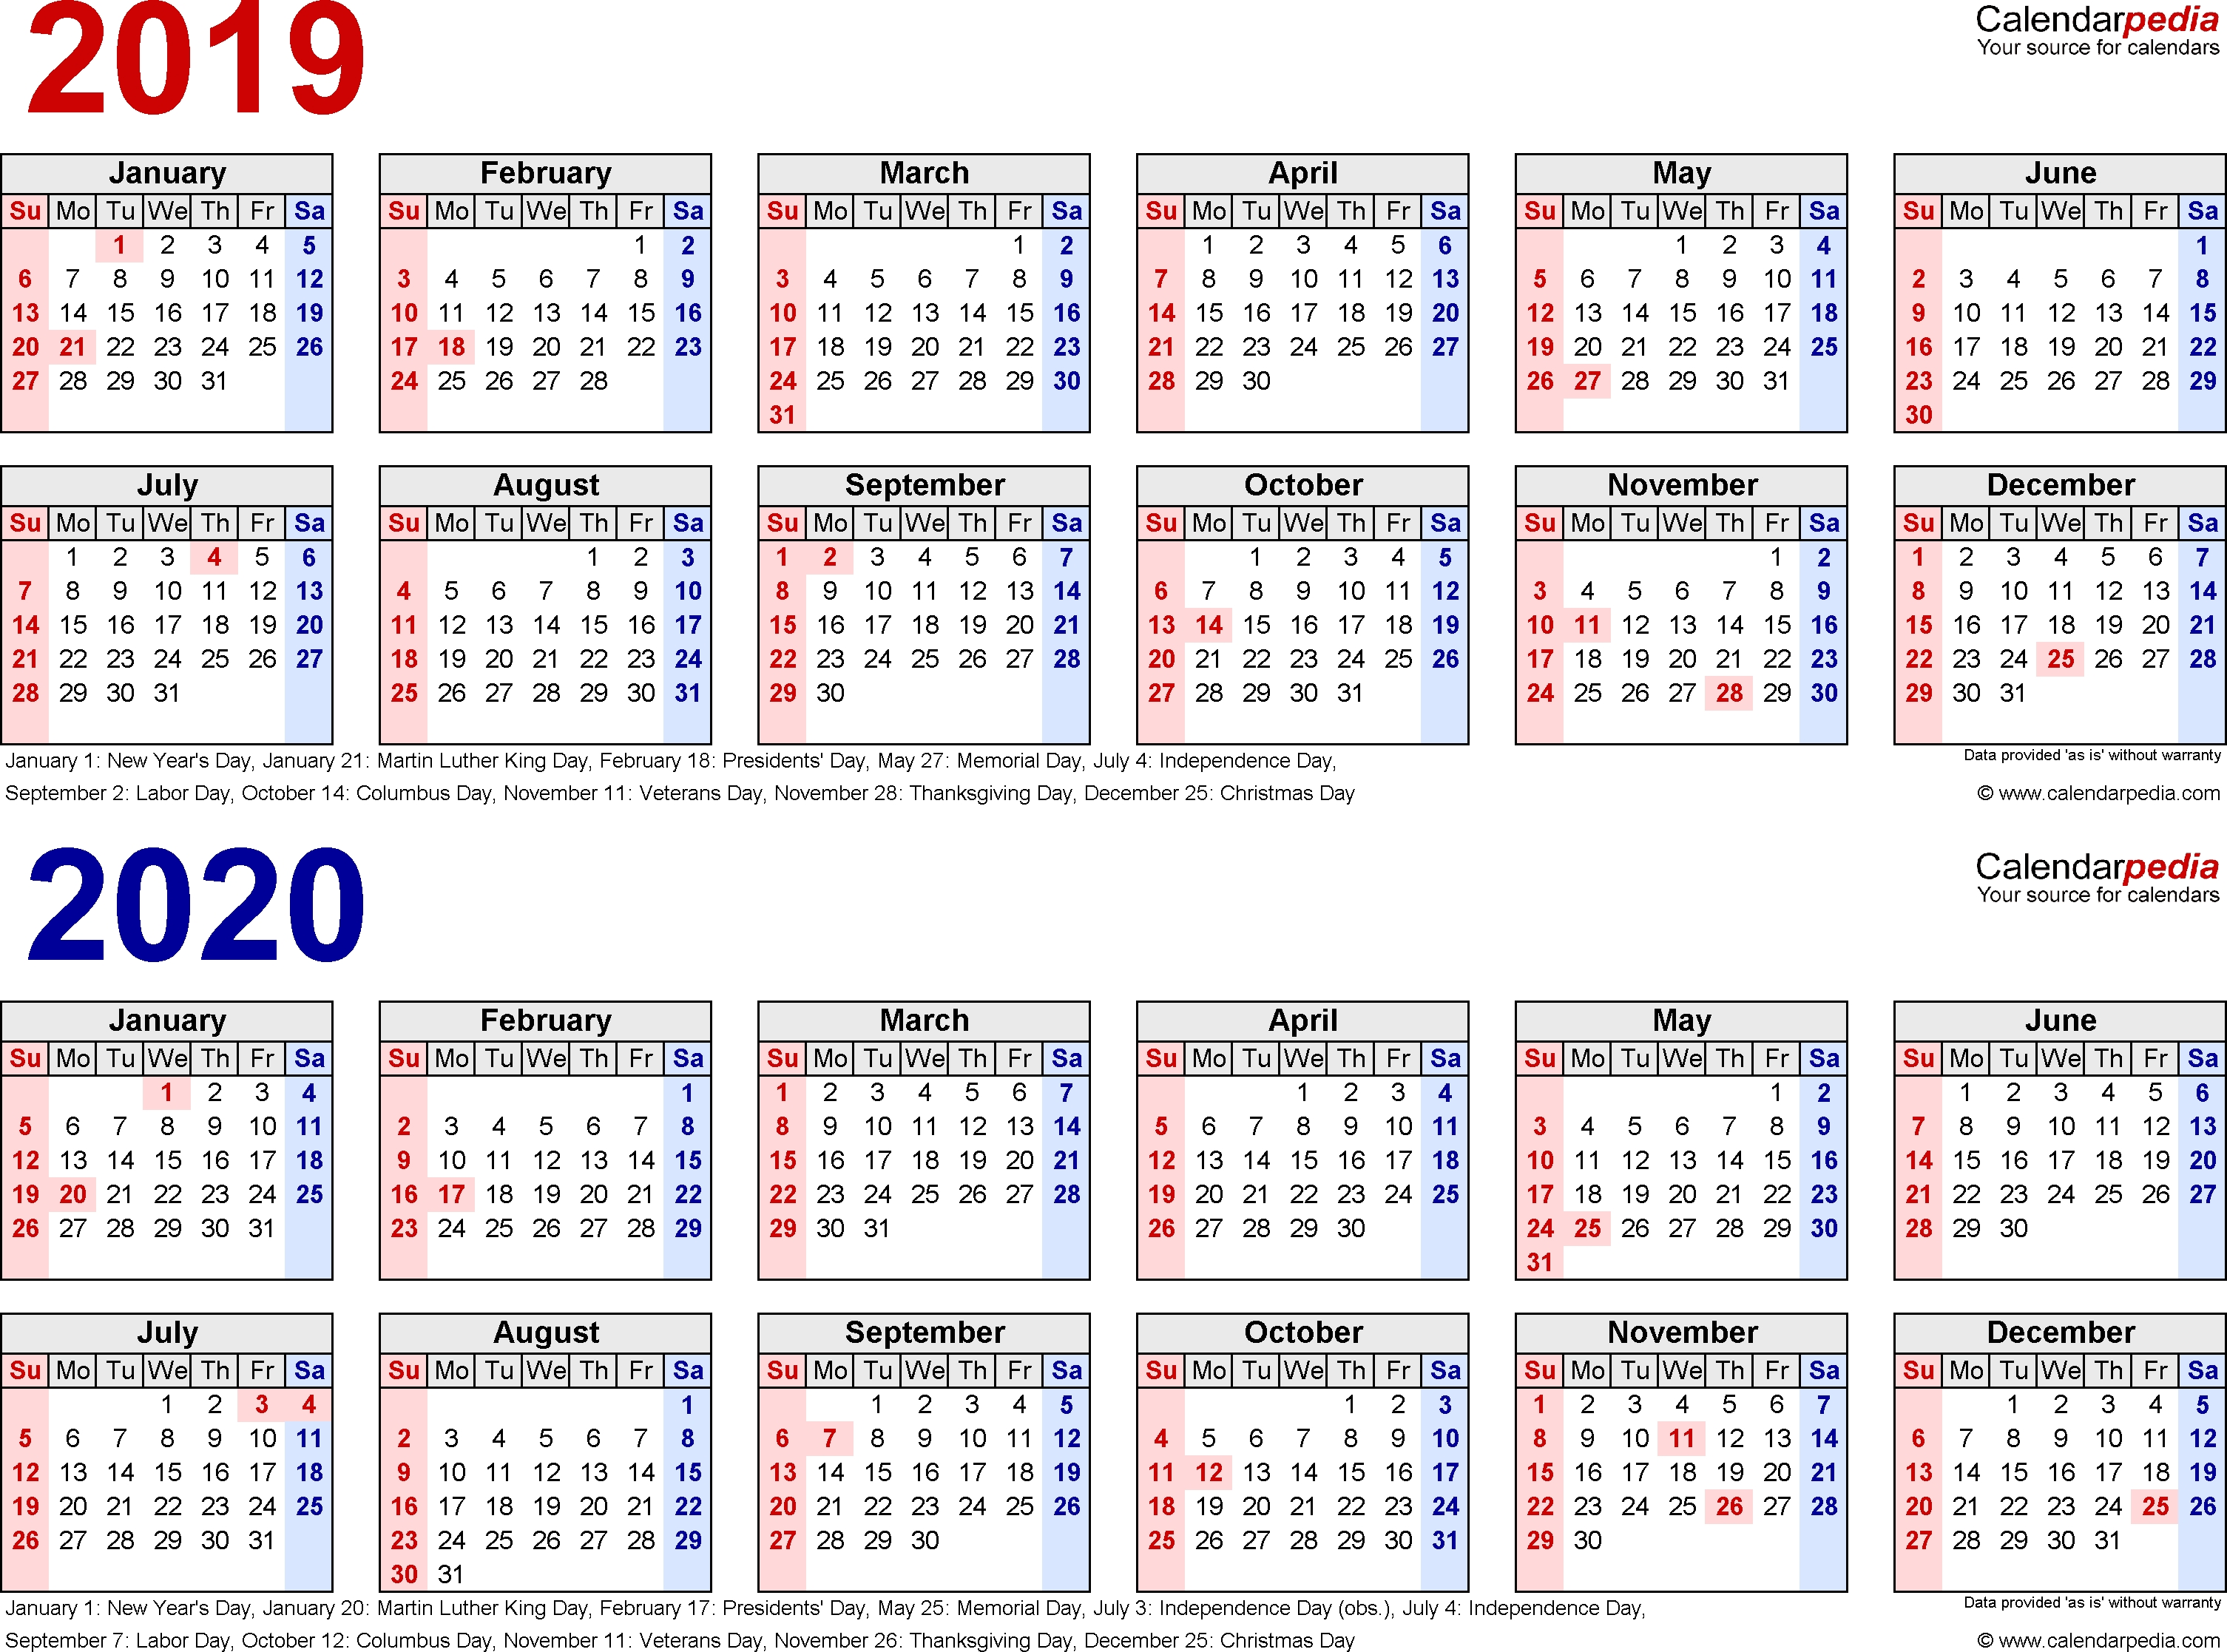 2019-2020 Calendar - Free Printable Two-Year Pdf Calendars regarding Pritnable 5 Day Calendar 2019-2020